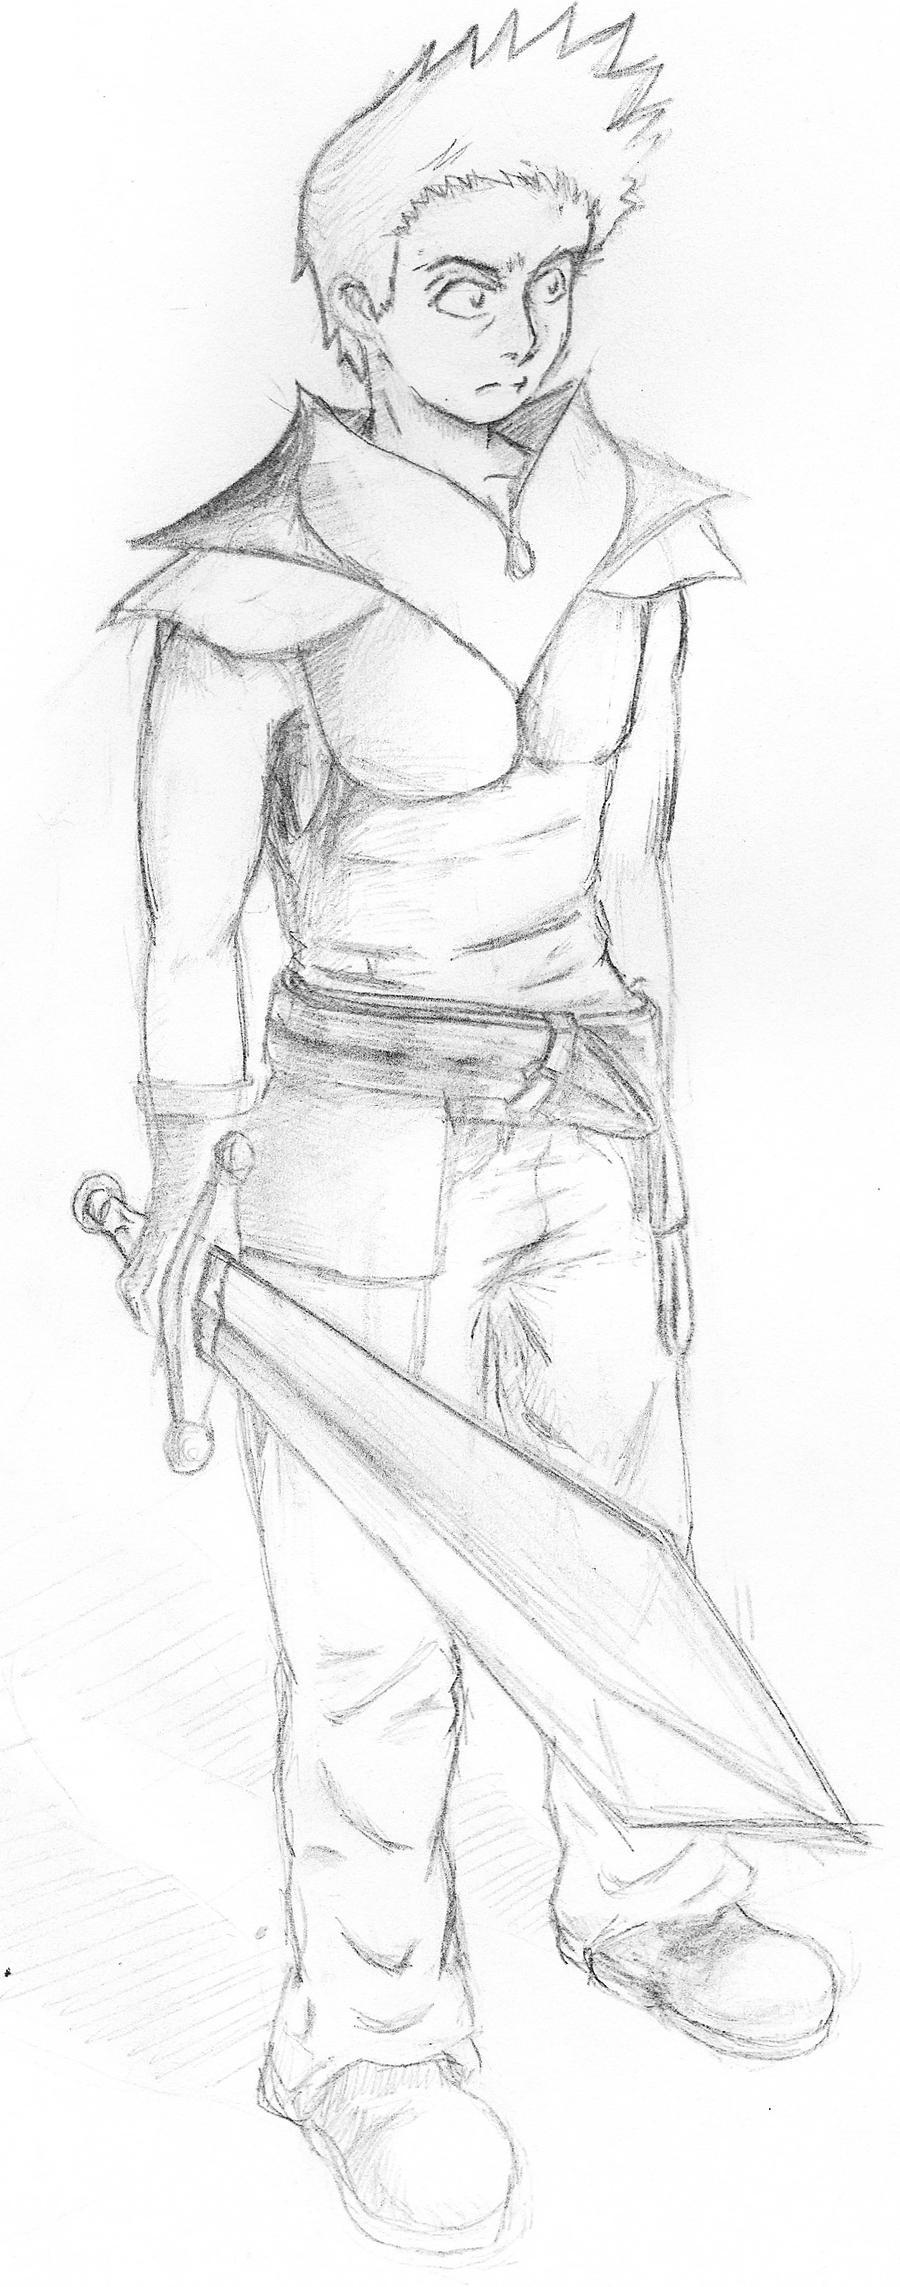 .:DaniDL's Gallery:. Sketch_2_by_DaniDL